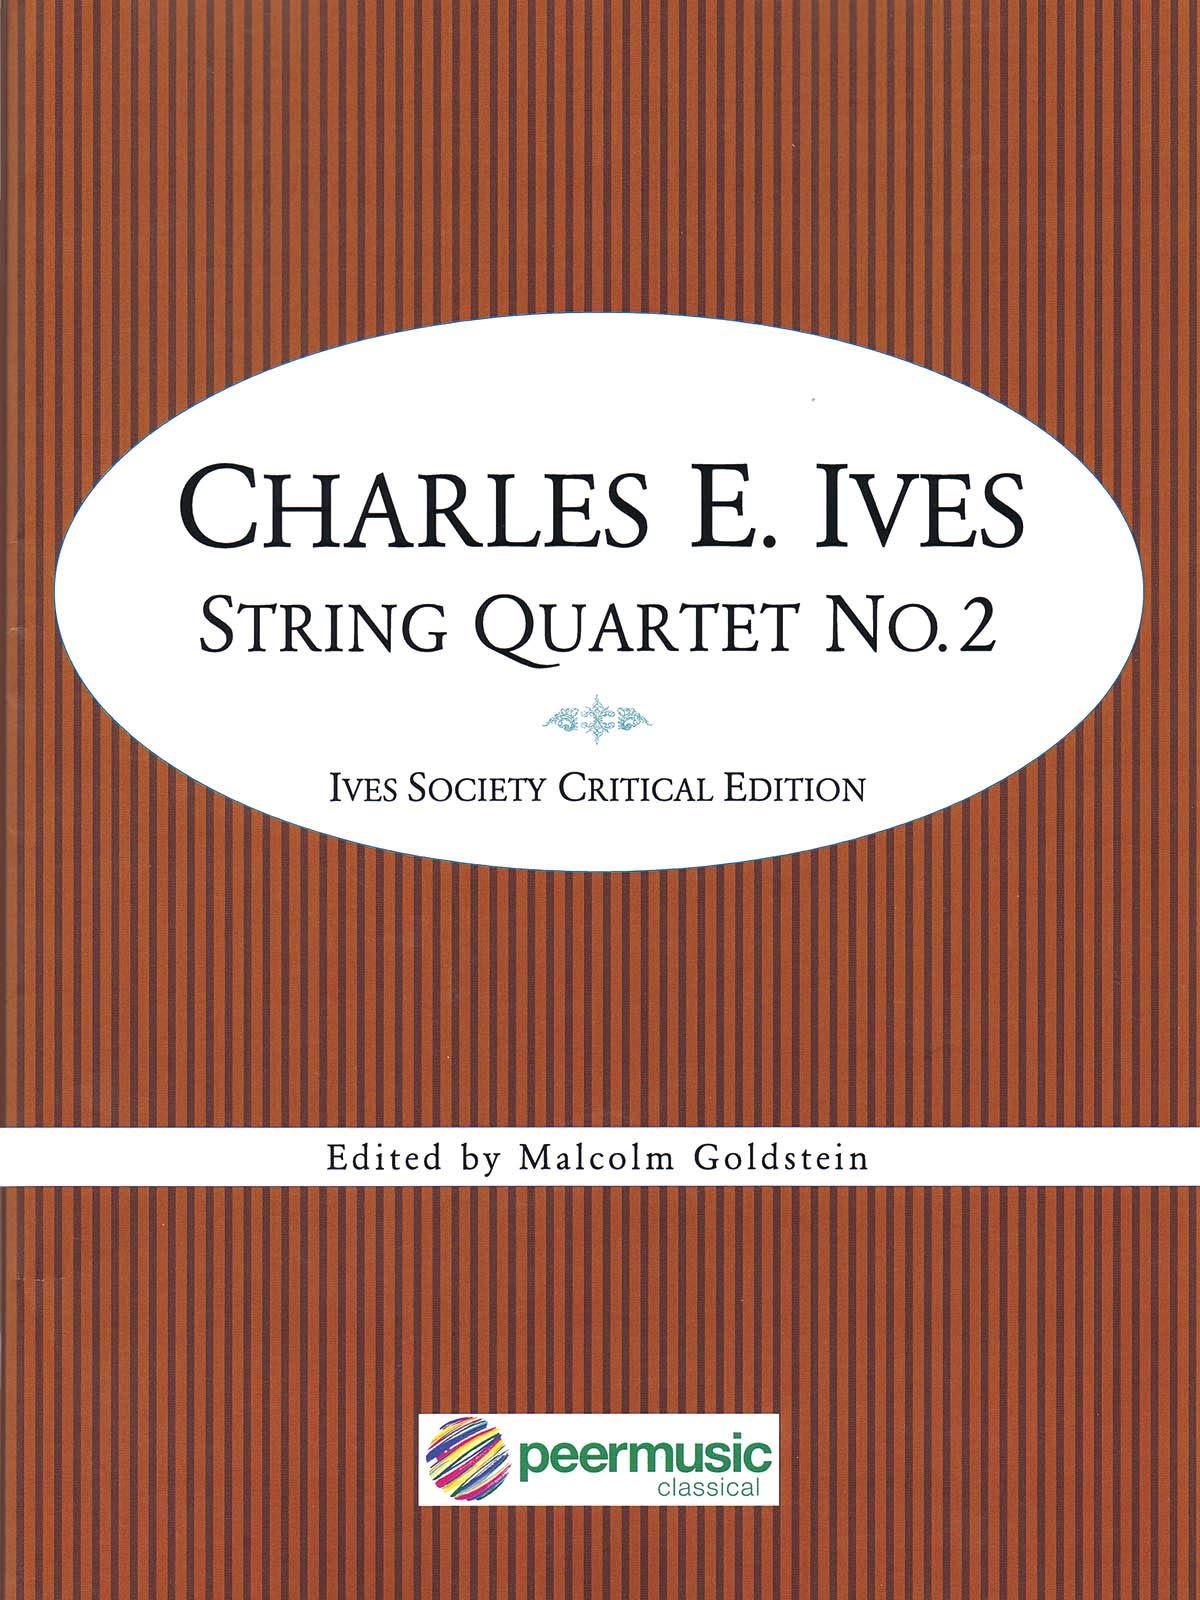 Amazon.com: Ives: String Quartet No. 2: 0888680631758: Charles Ives: Books